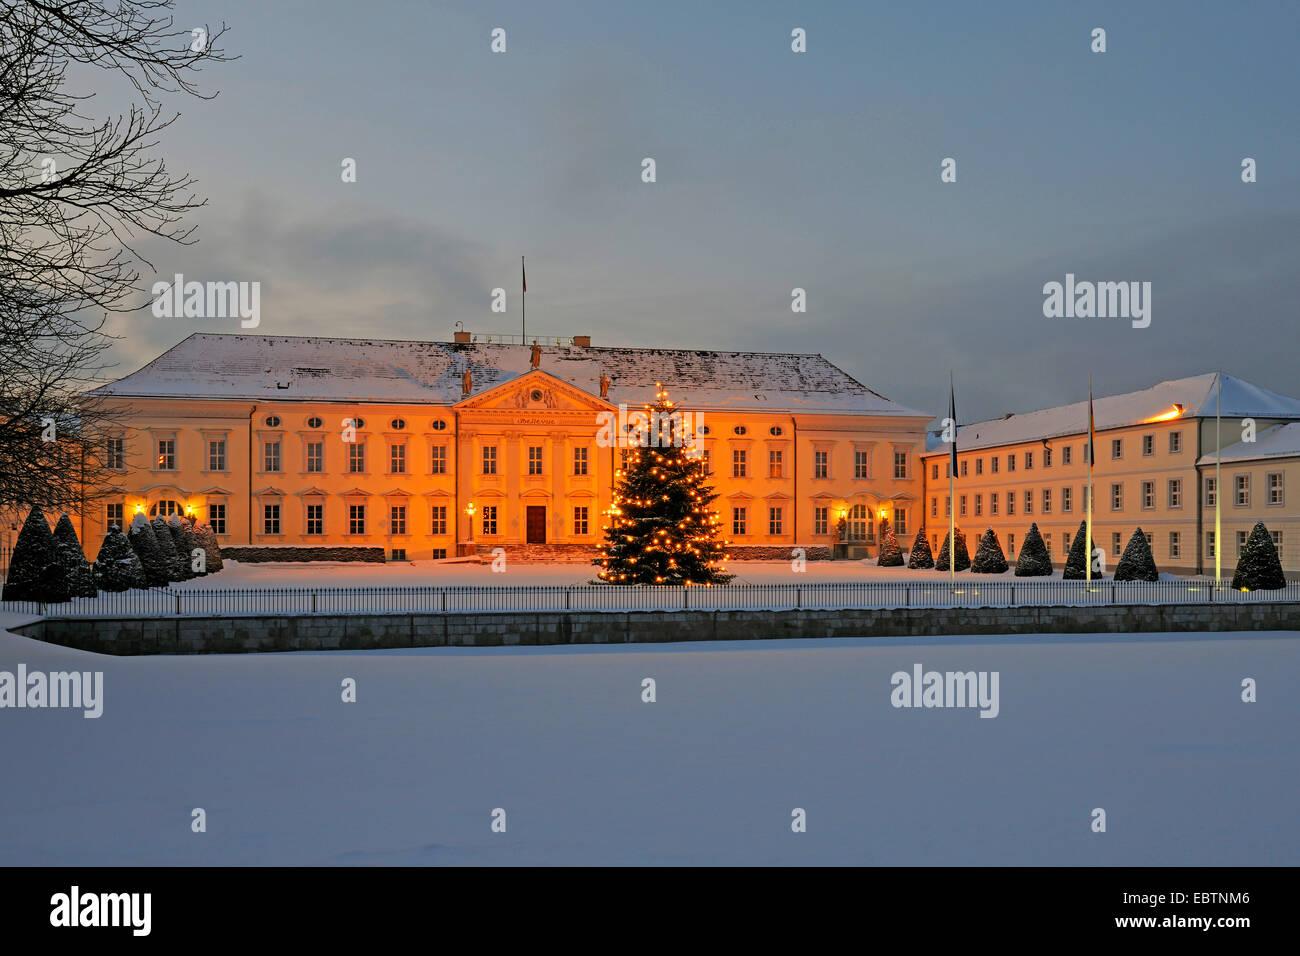 Ufficio In Tedesco : Schloss bellevue bellevue palace ufficio del presidente tedesco